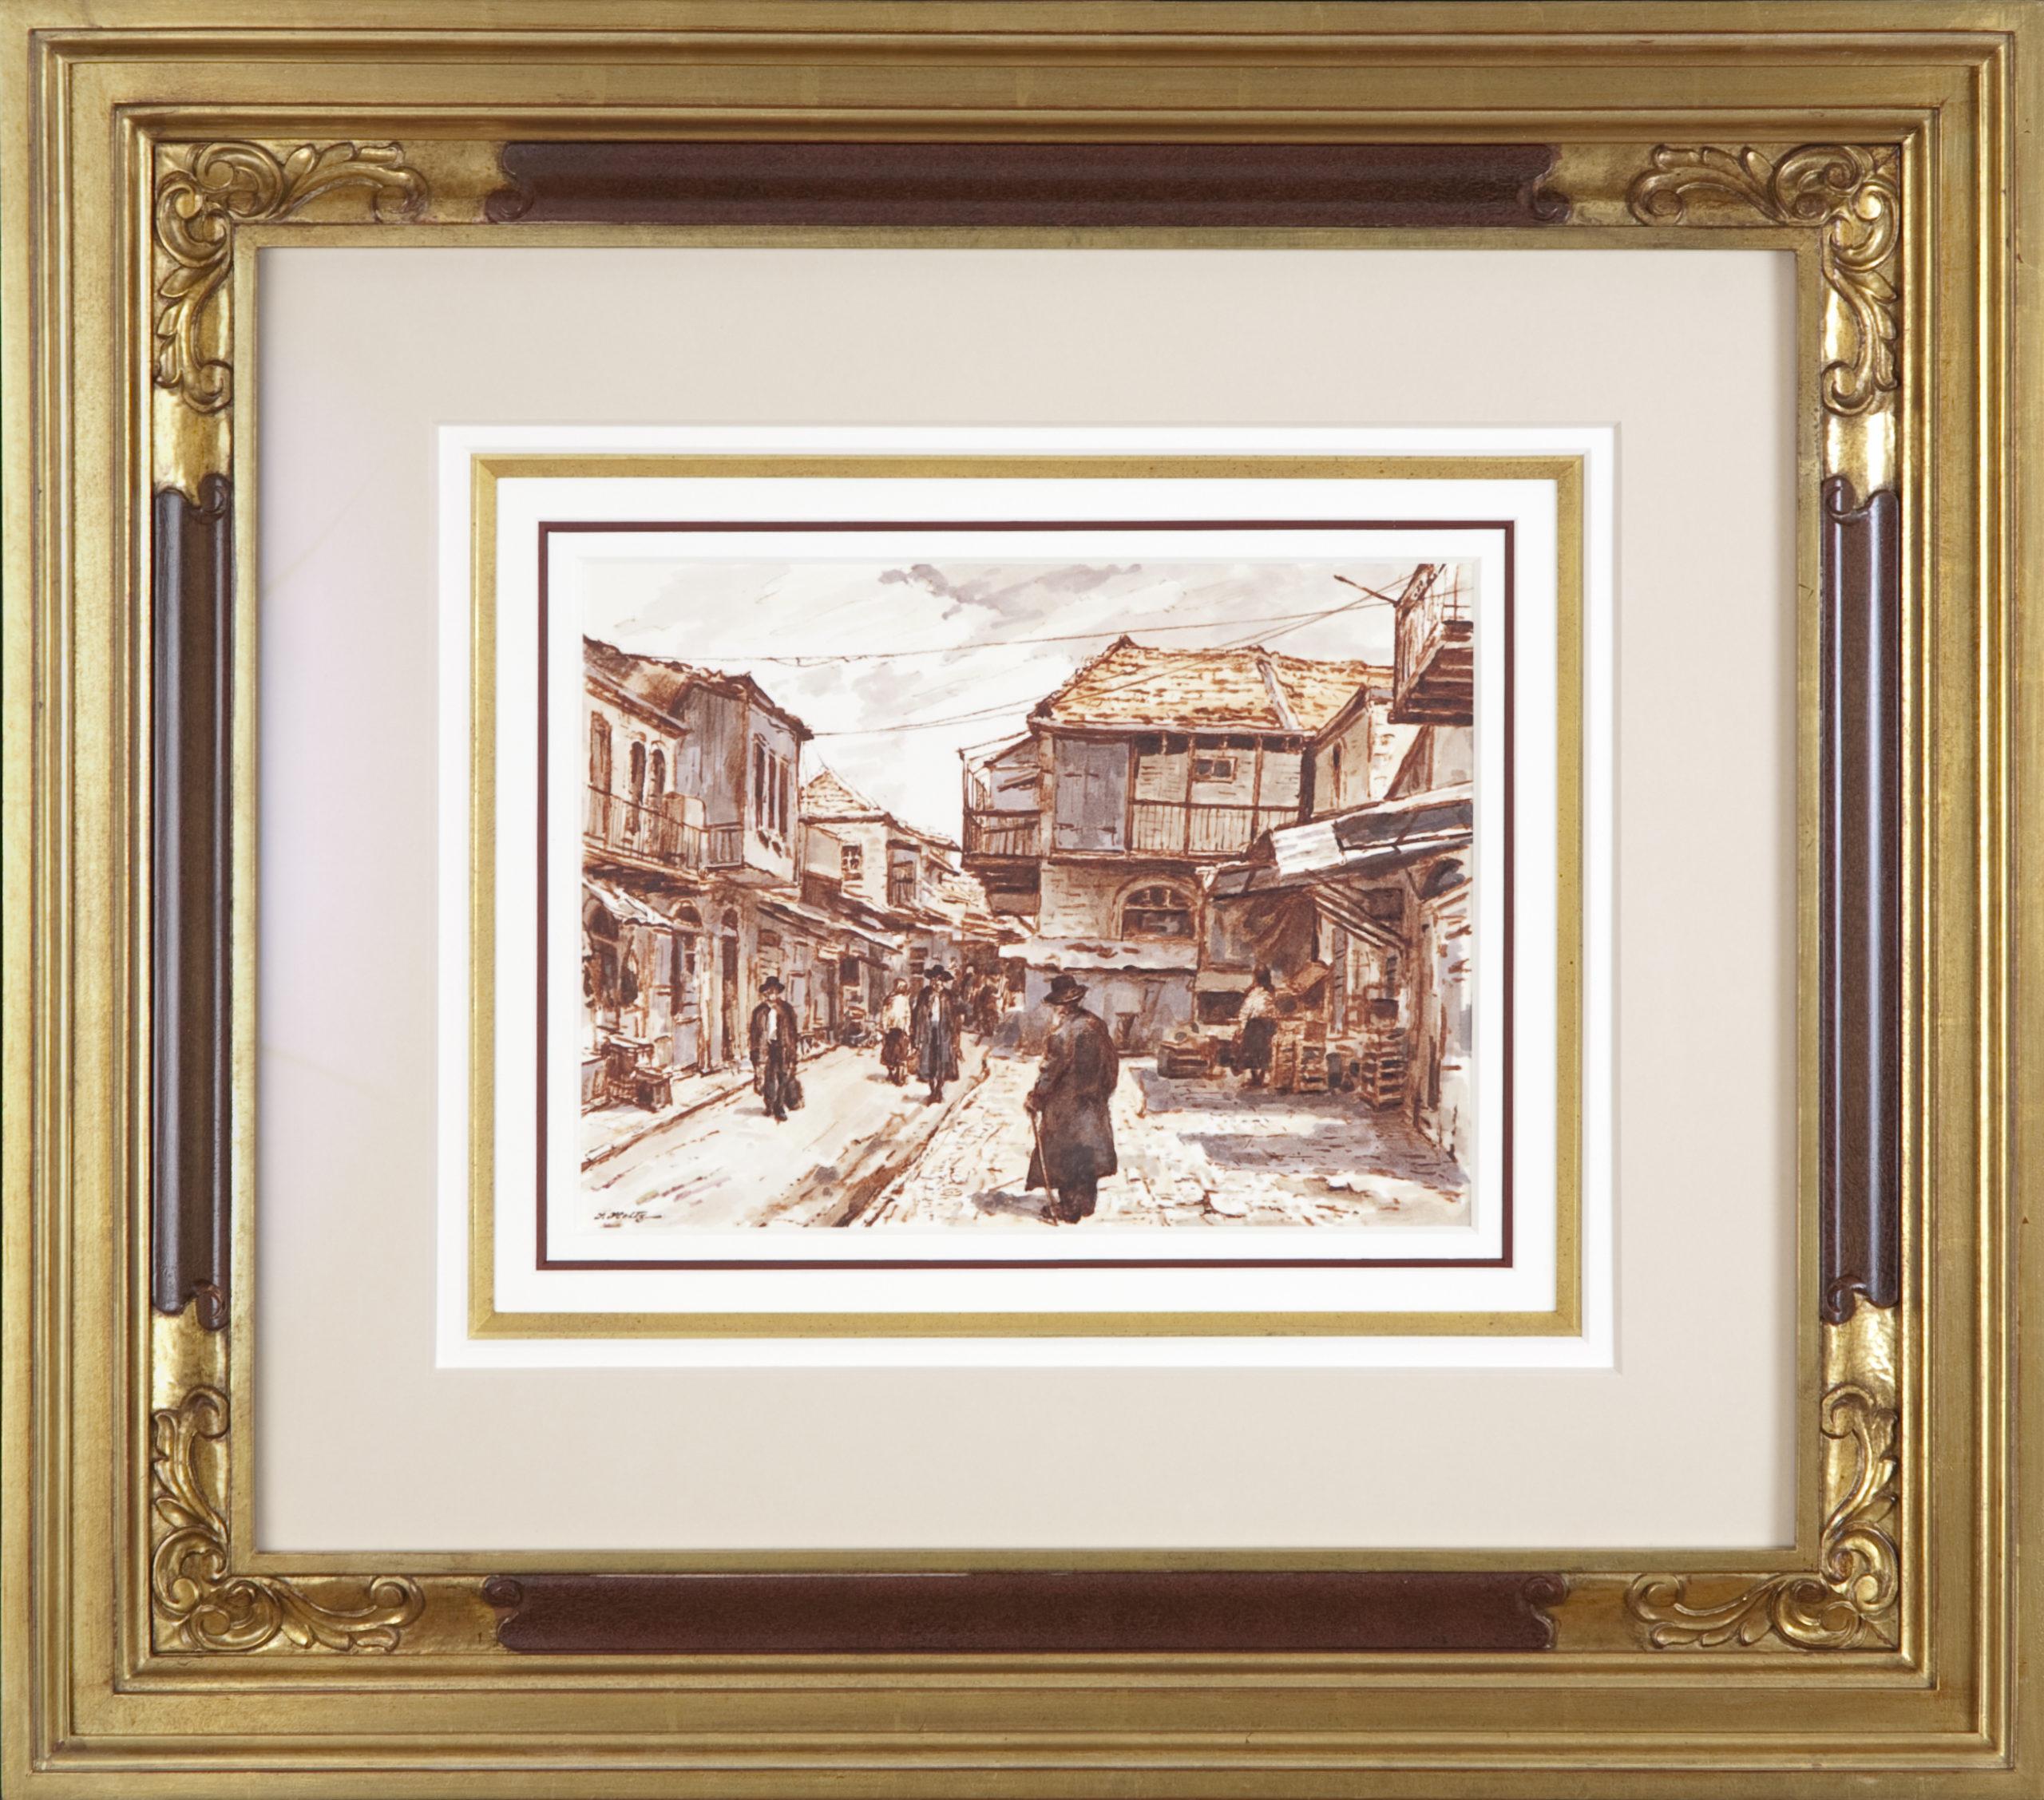 174 Meah Shearim 1974 - Marker - 11.5 x 9 - Frame: 27 x 24 x 2.75